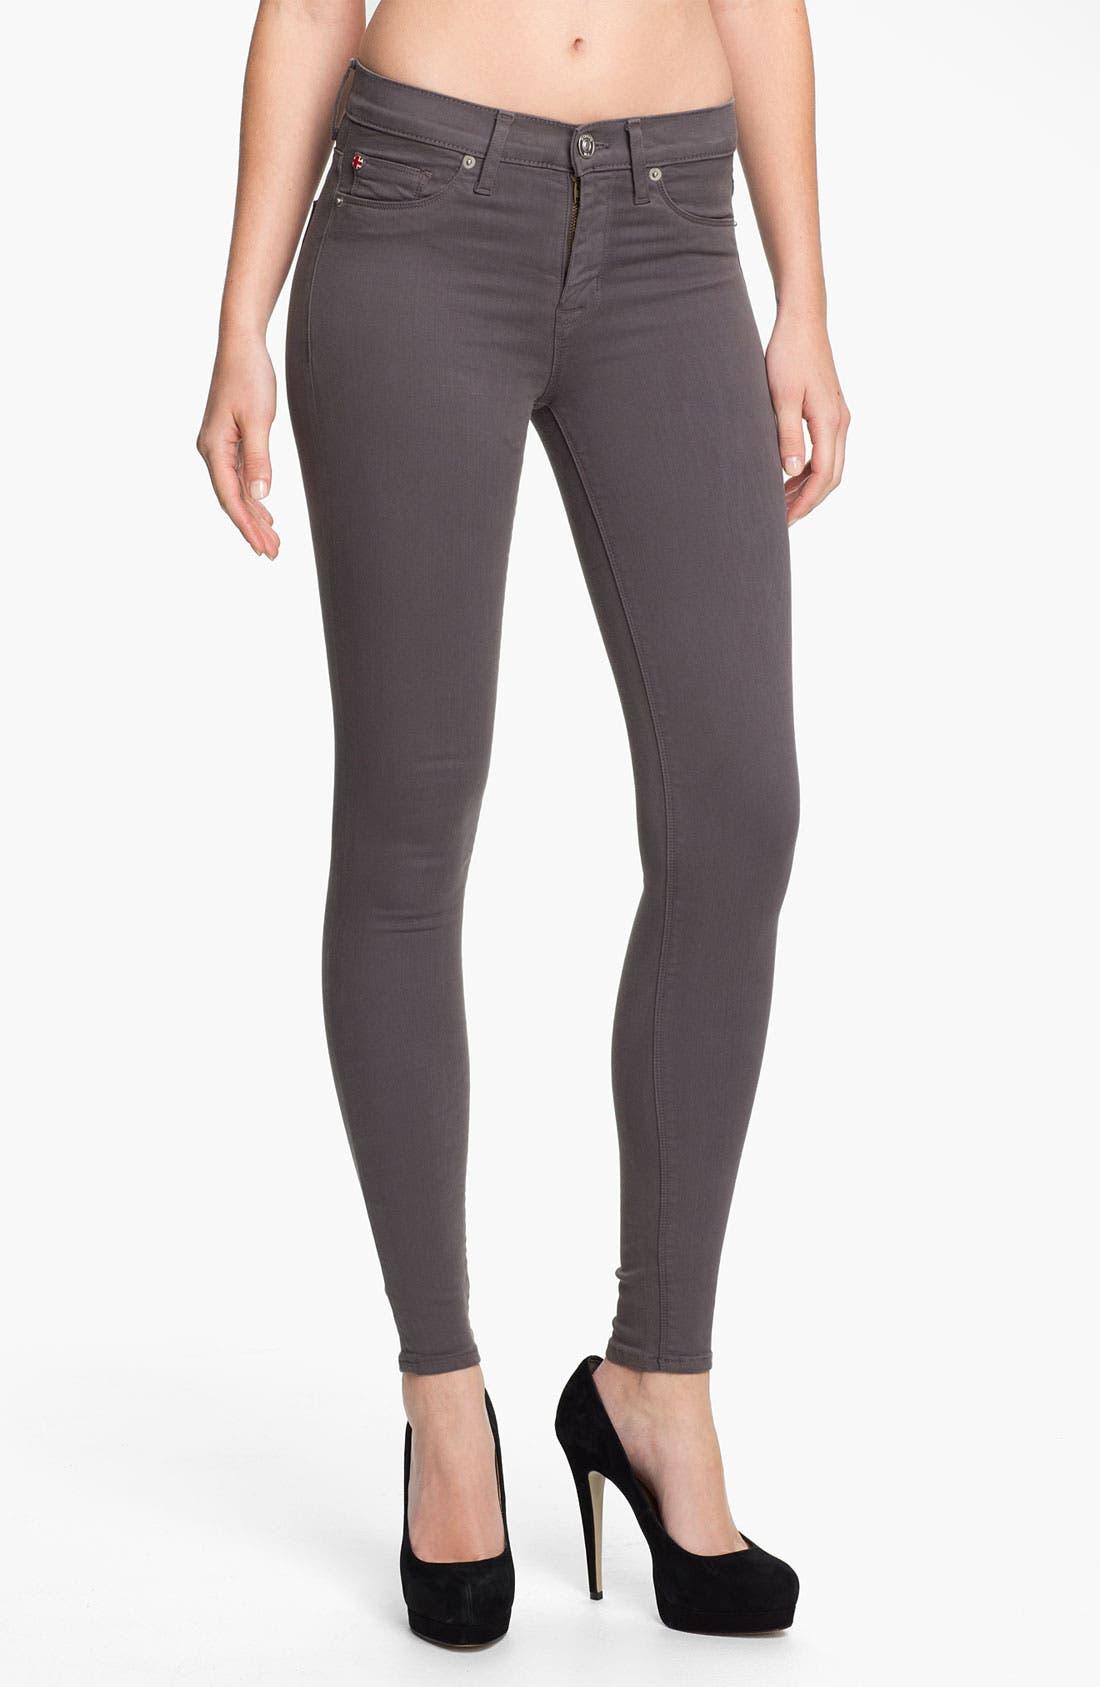 Main Image - Hudson Jeans 'Nico' Skinny Stretch Jeans (Dark Grey)